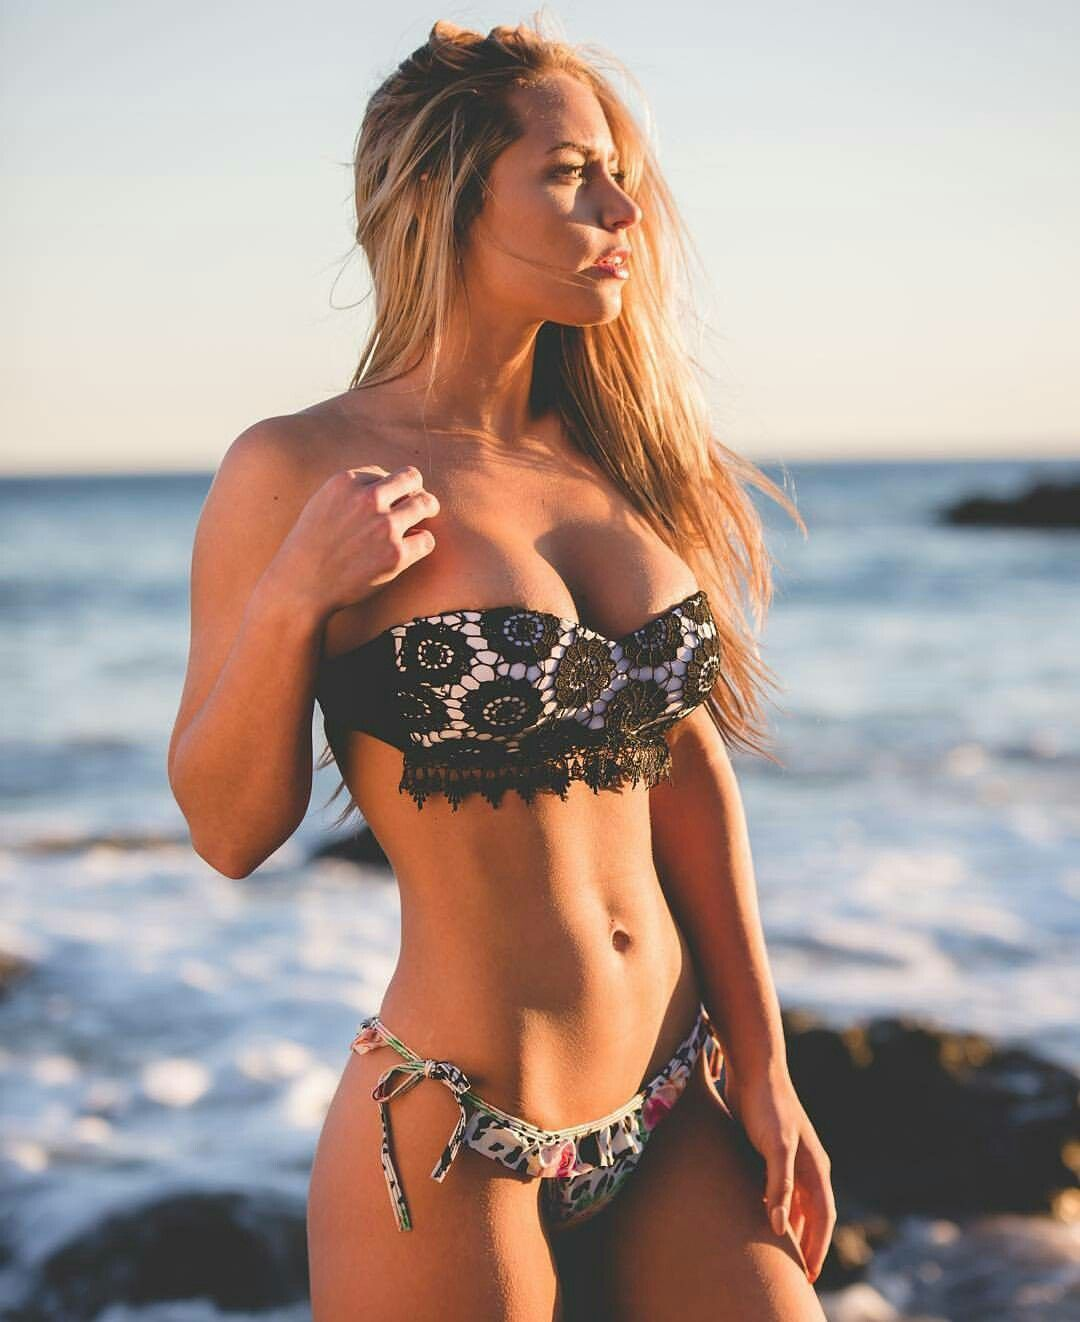 Youtube Belinda Peregrin nude (45 foto and video), Tits, Paparazzi, Boobs, panties 2018